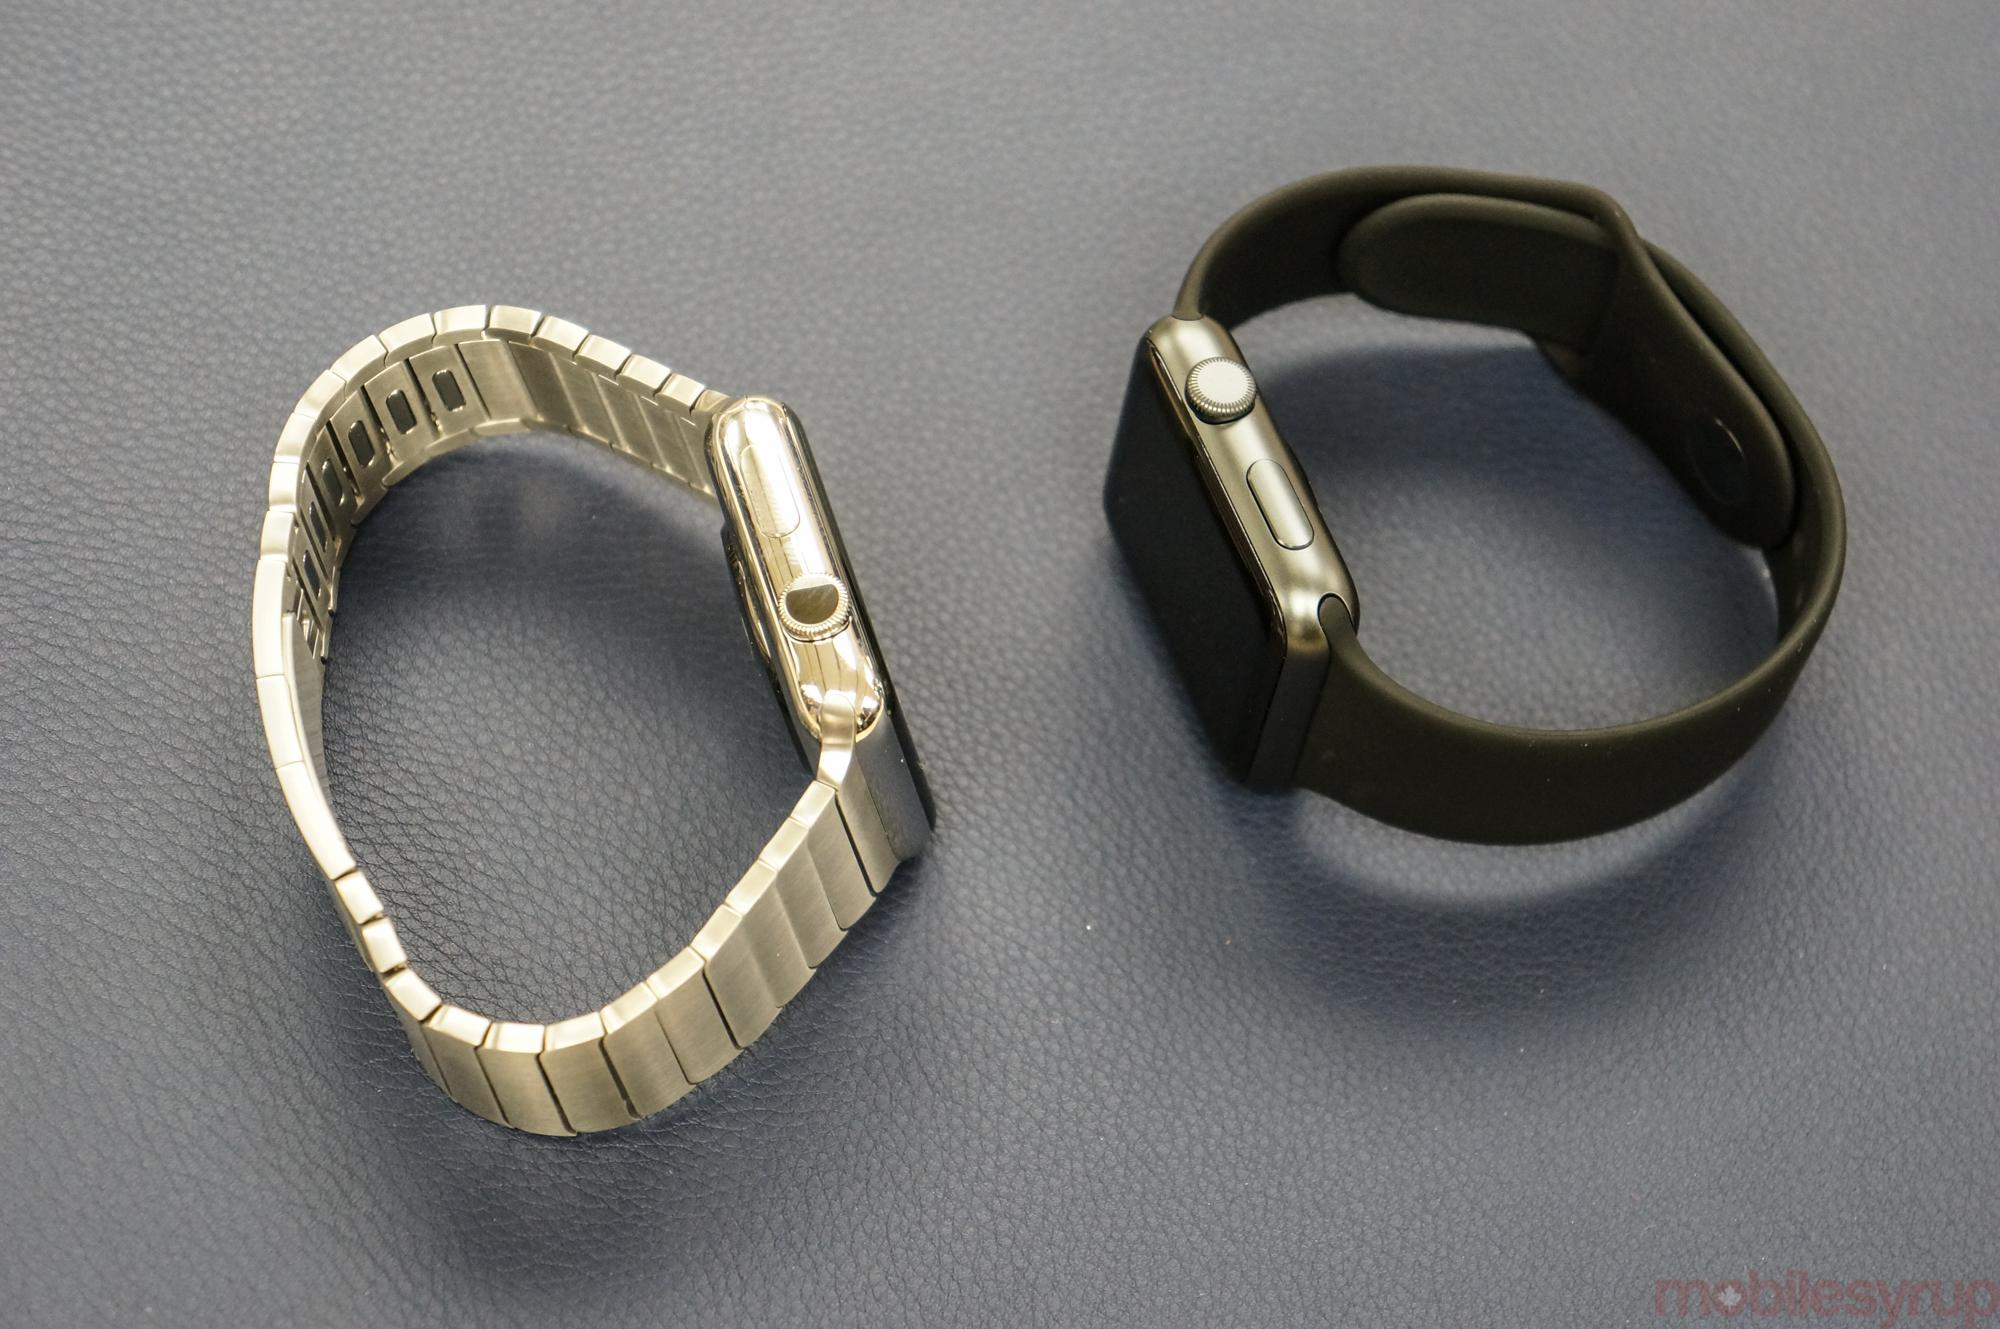 applewatchpreorder-03549